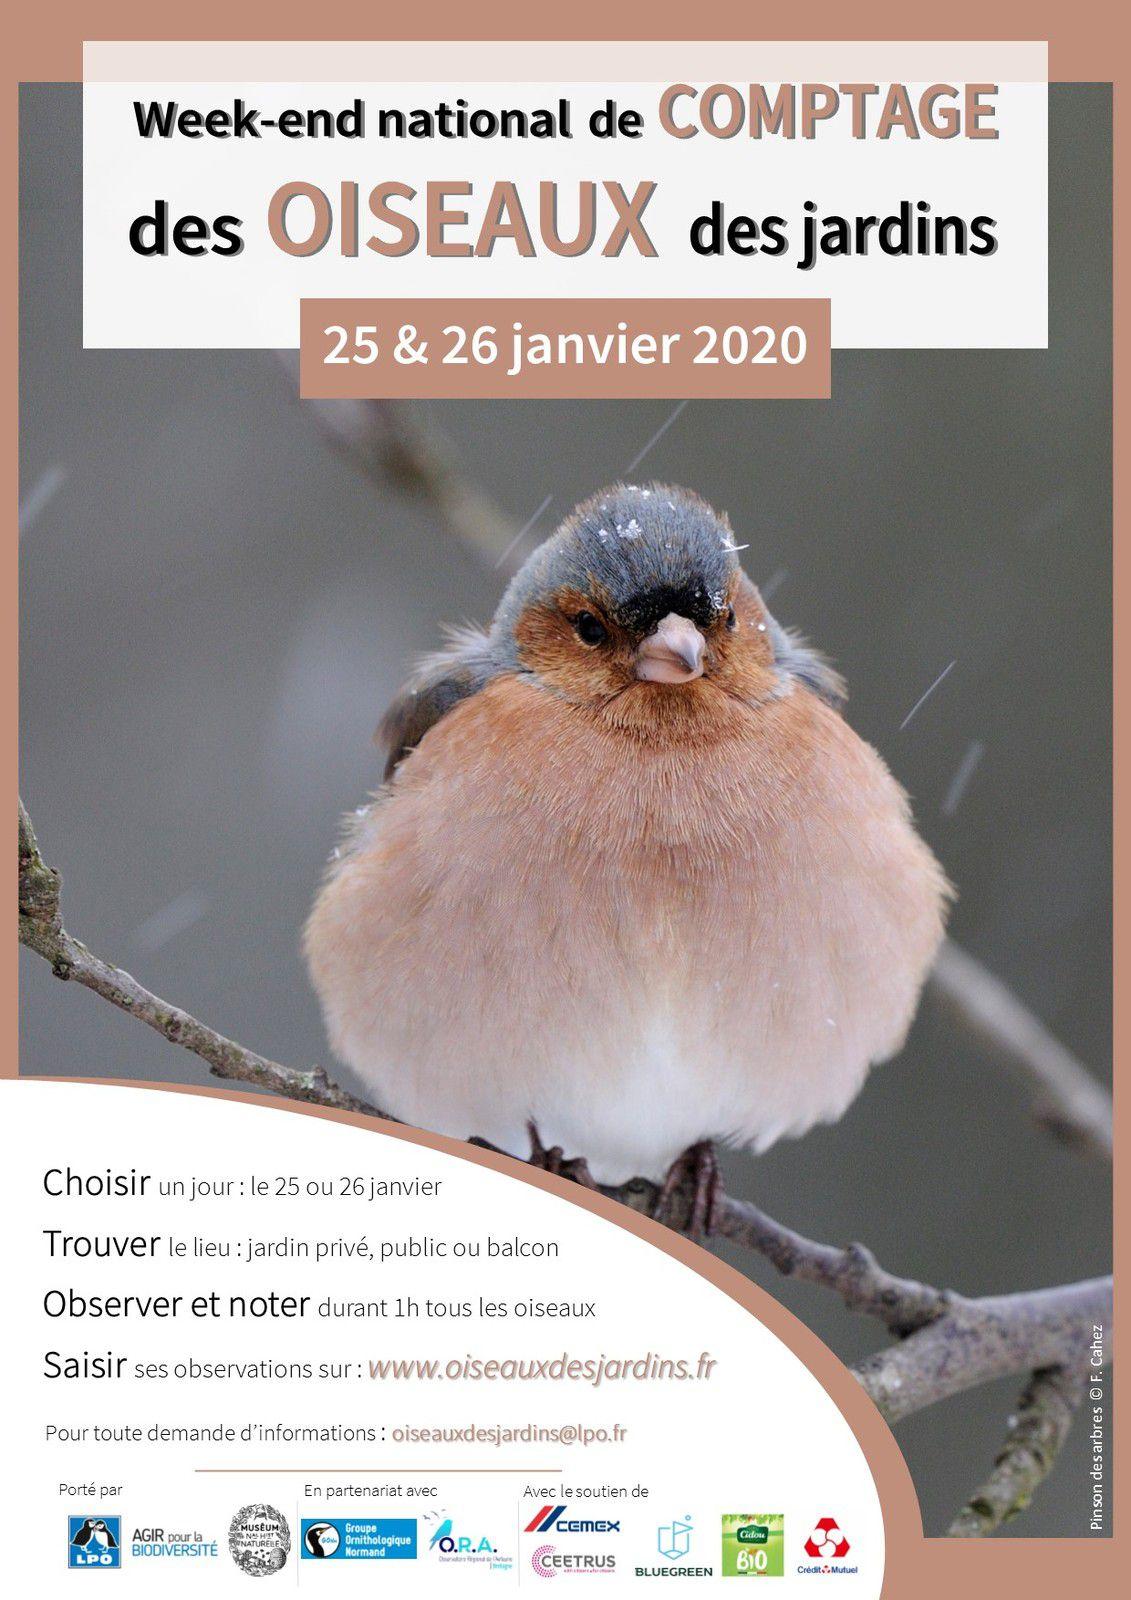 Week-end national de comptage des oiseaux des jardins !